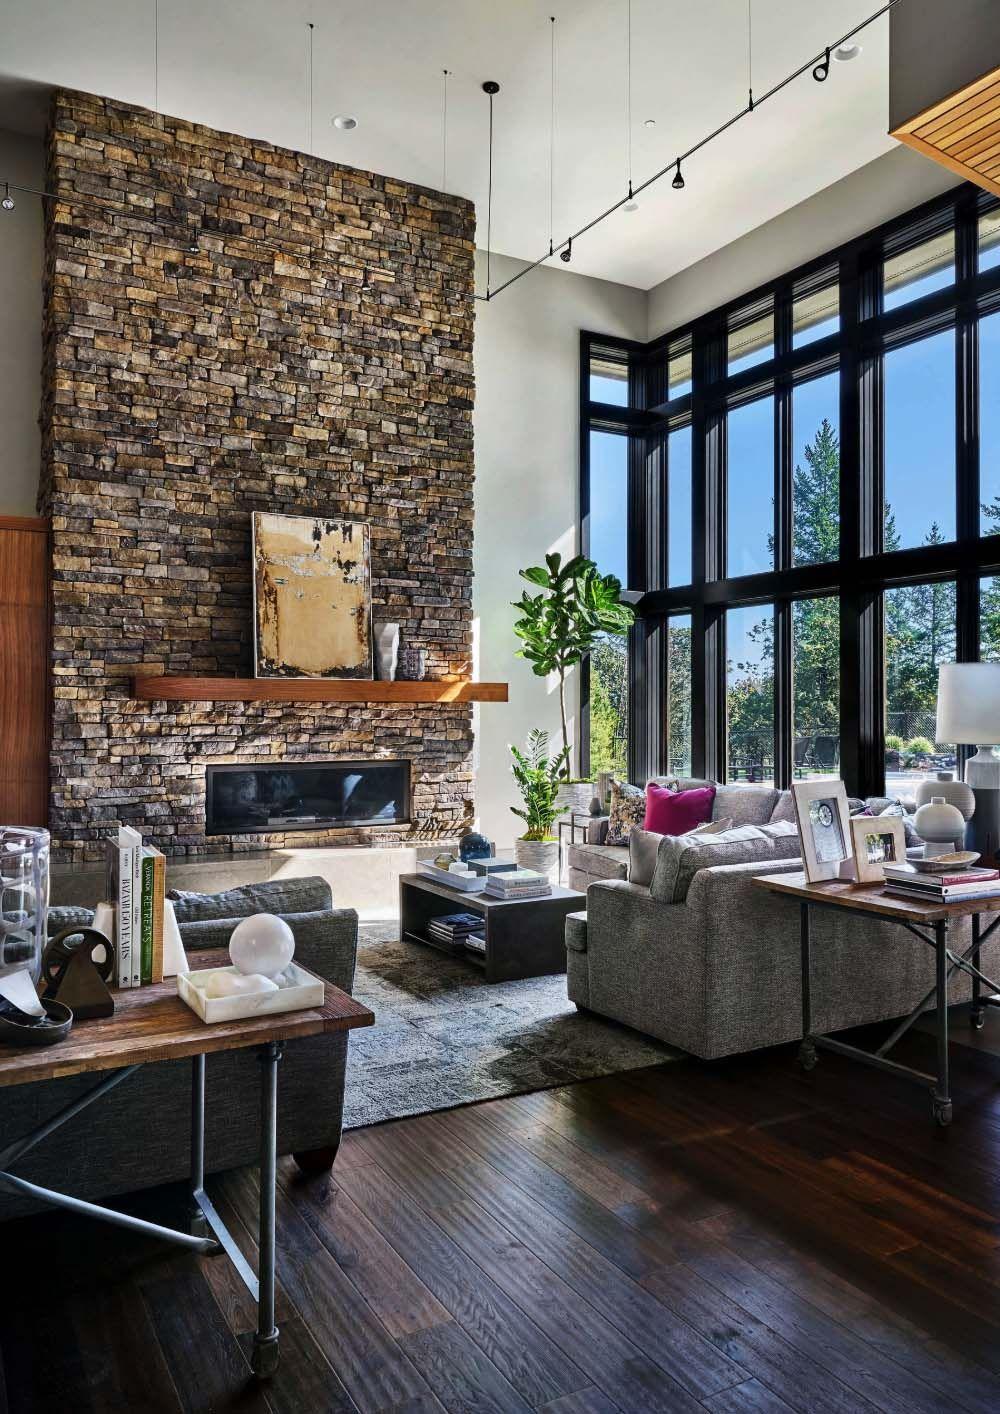 Classy Interior Designs With Slick Dark Accent Pieces Luxury Home Decor Contemporary Home Decor Luxury Living Room